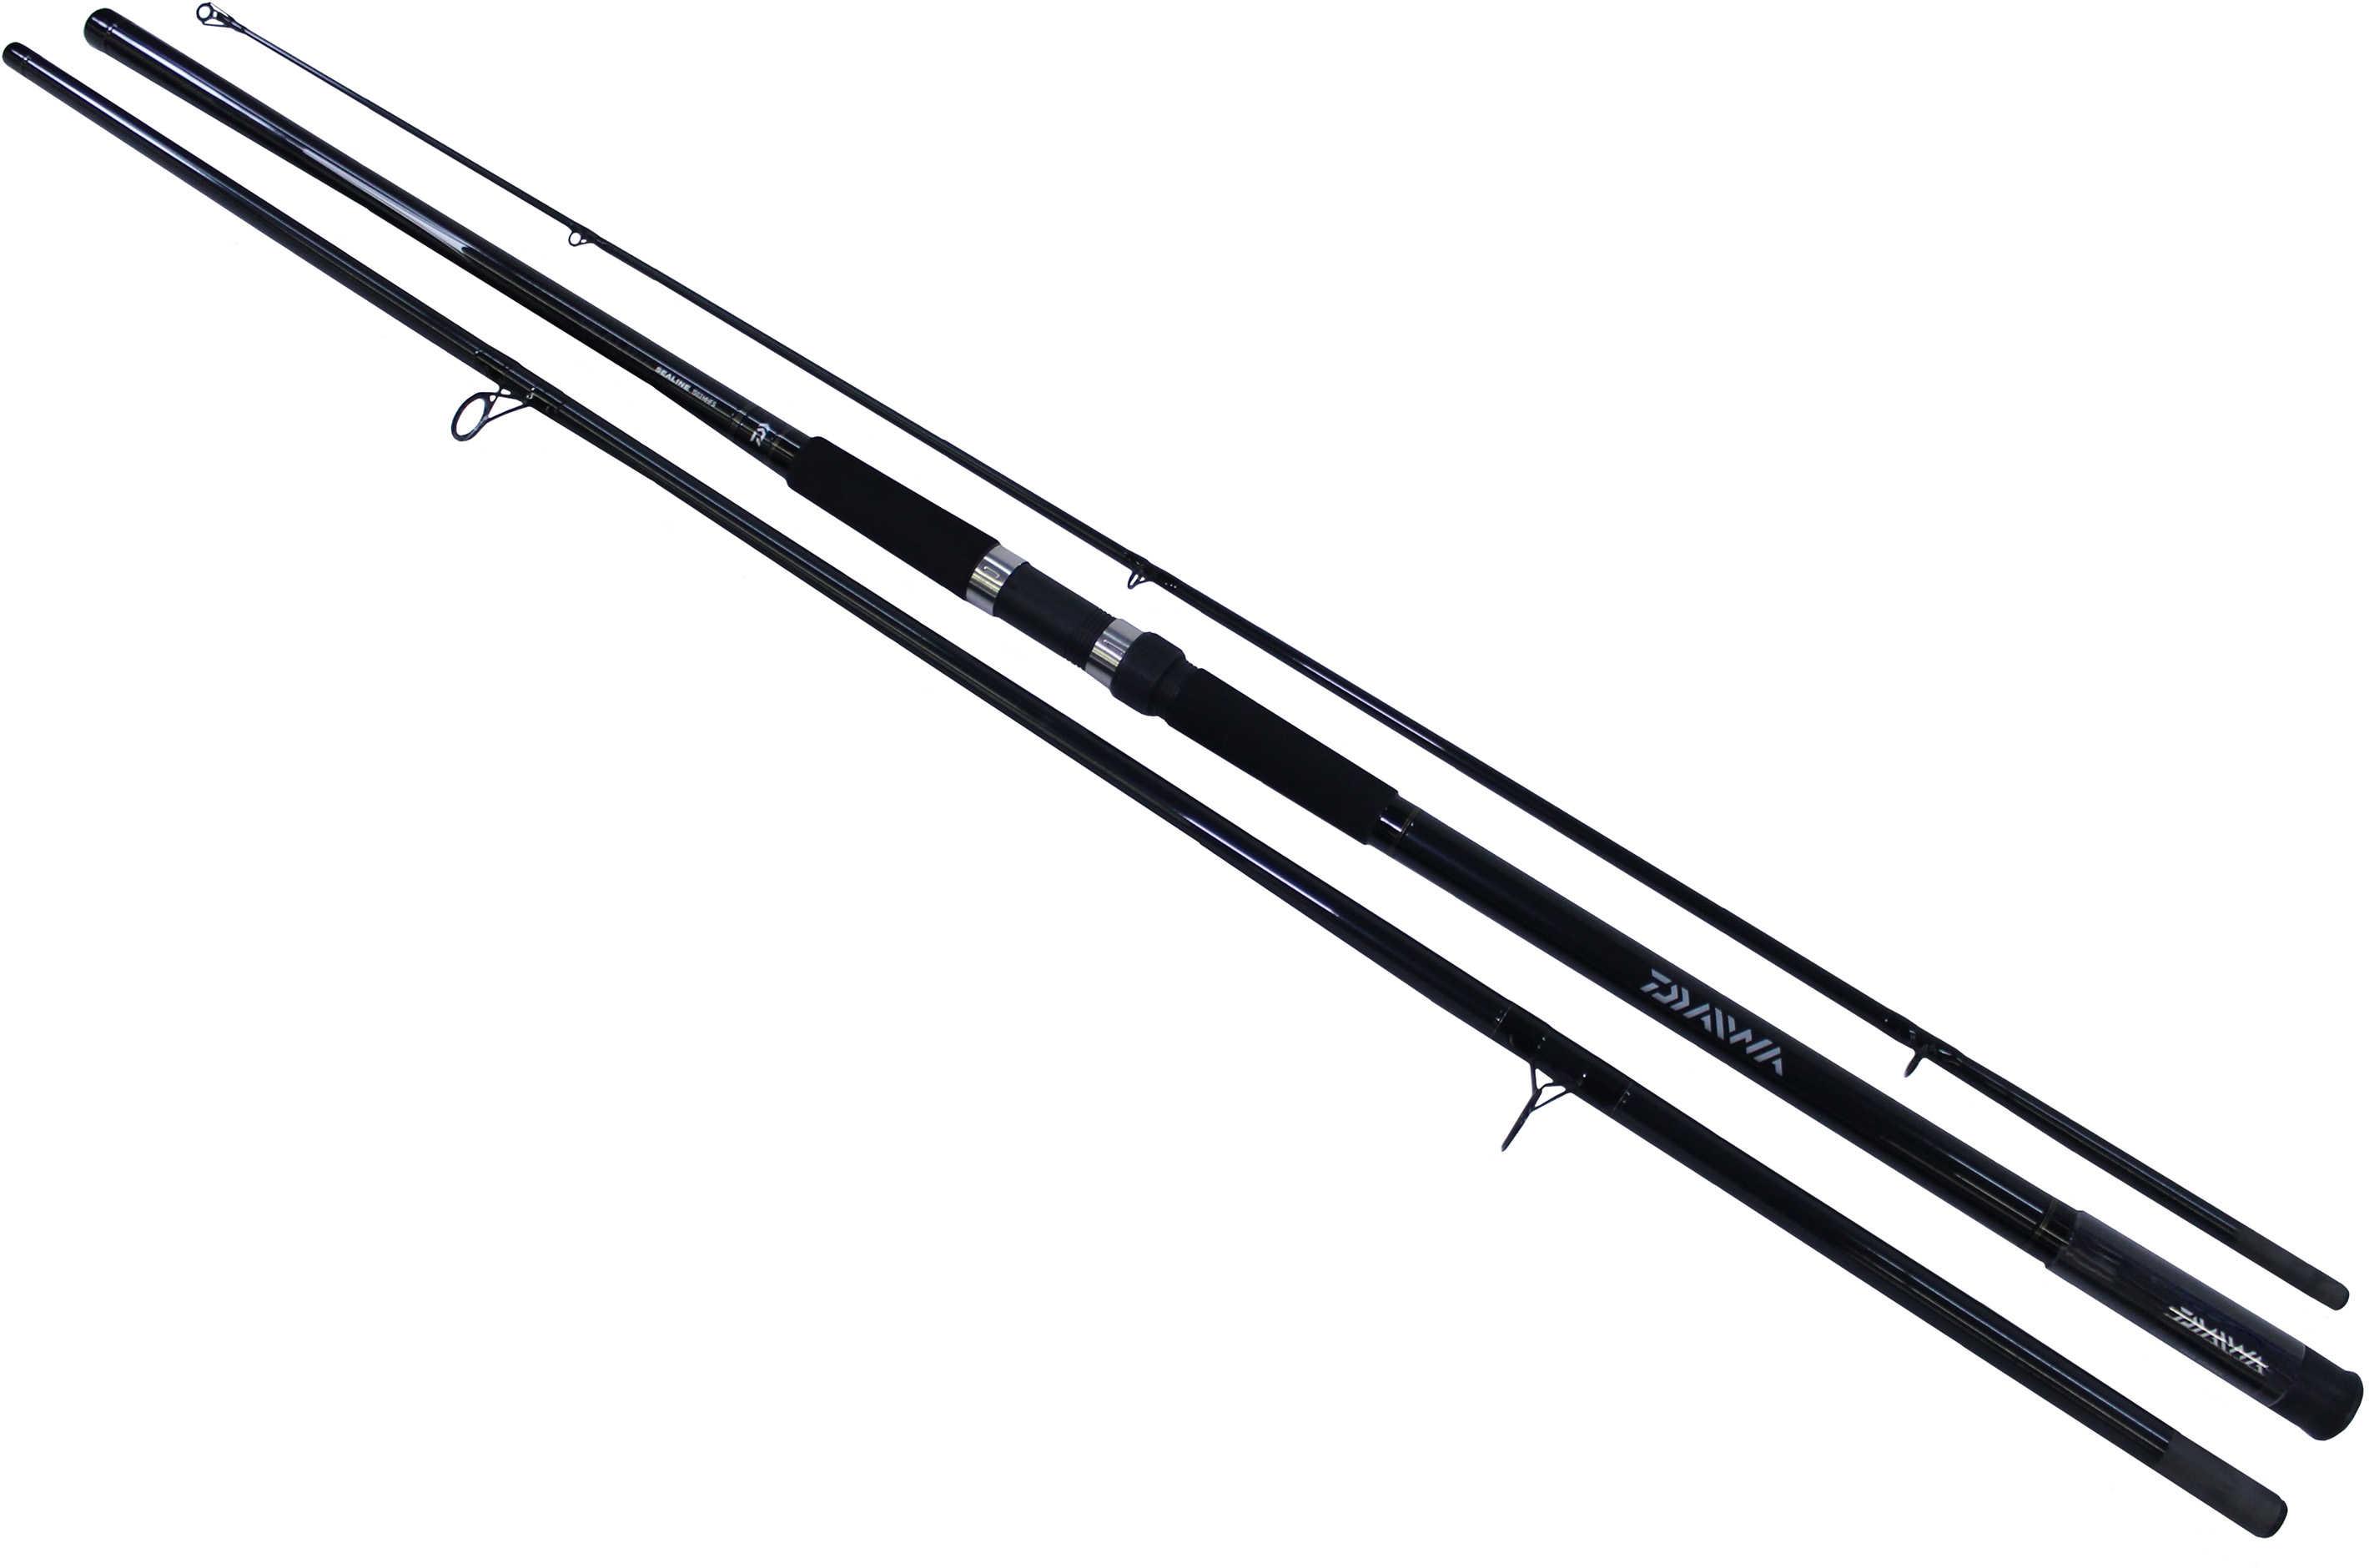 Daiwa Sealine Surf SLS Spinning Rod 15' 3 Piece Rod, 17-40 lb Line Rate, 1-6 oz Lure Rate, Medium/Heavy P